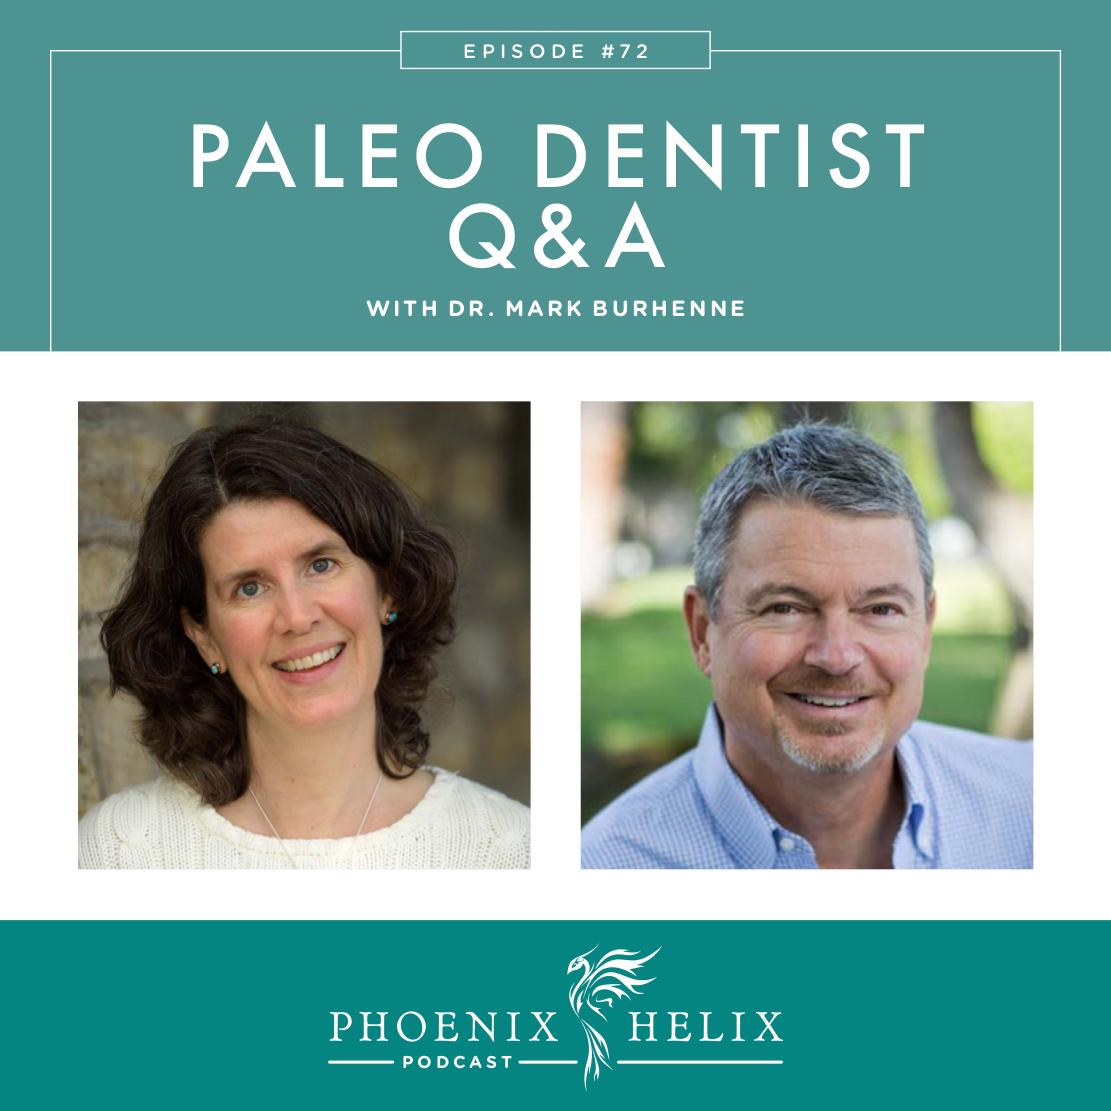 Paleo Dentist Q&A with Dr. Mark Burhenne | Phoenix Helix Podcast